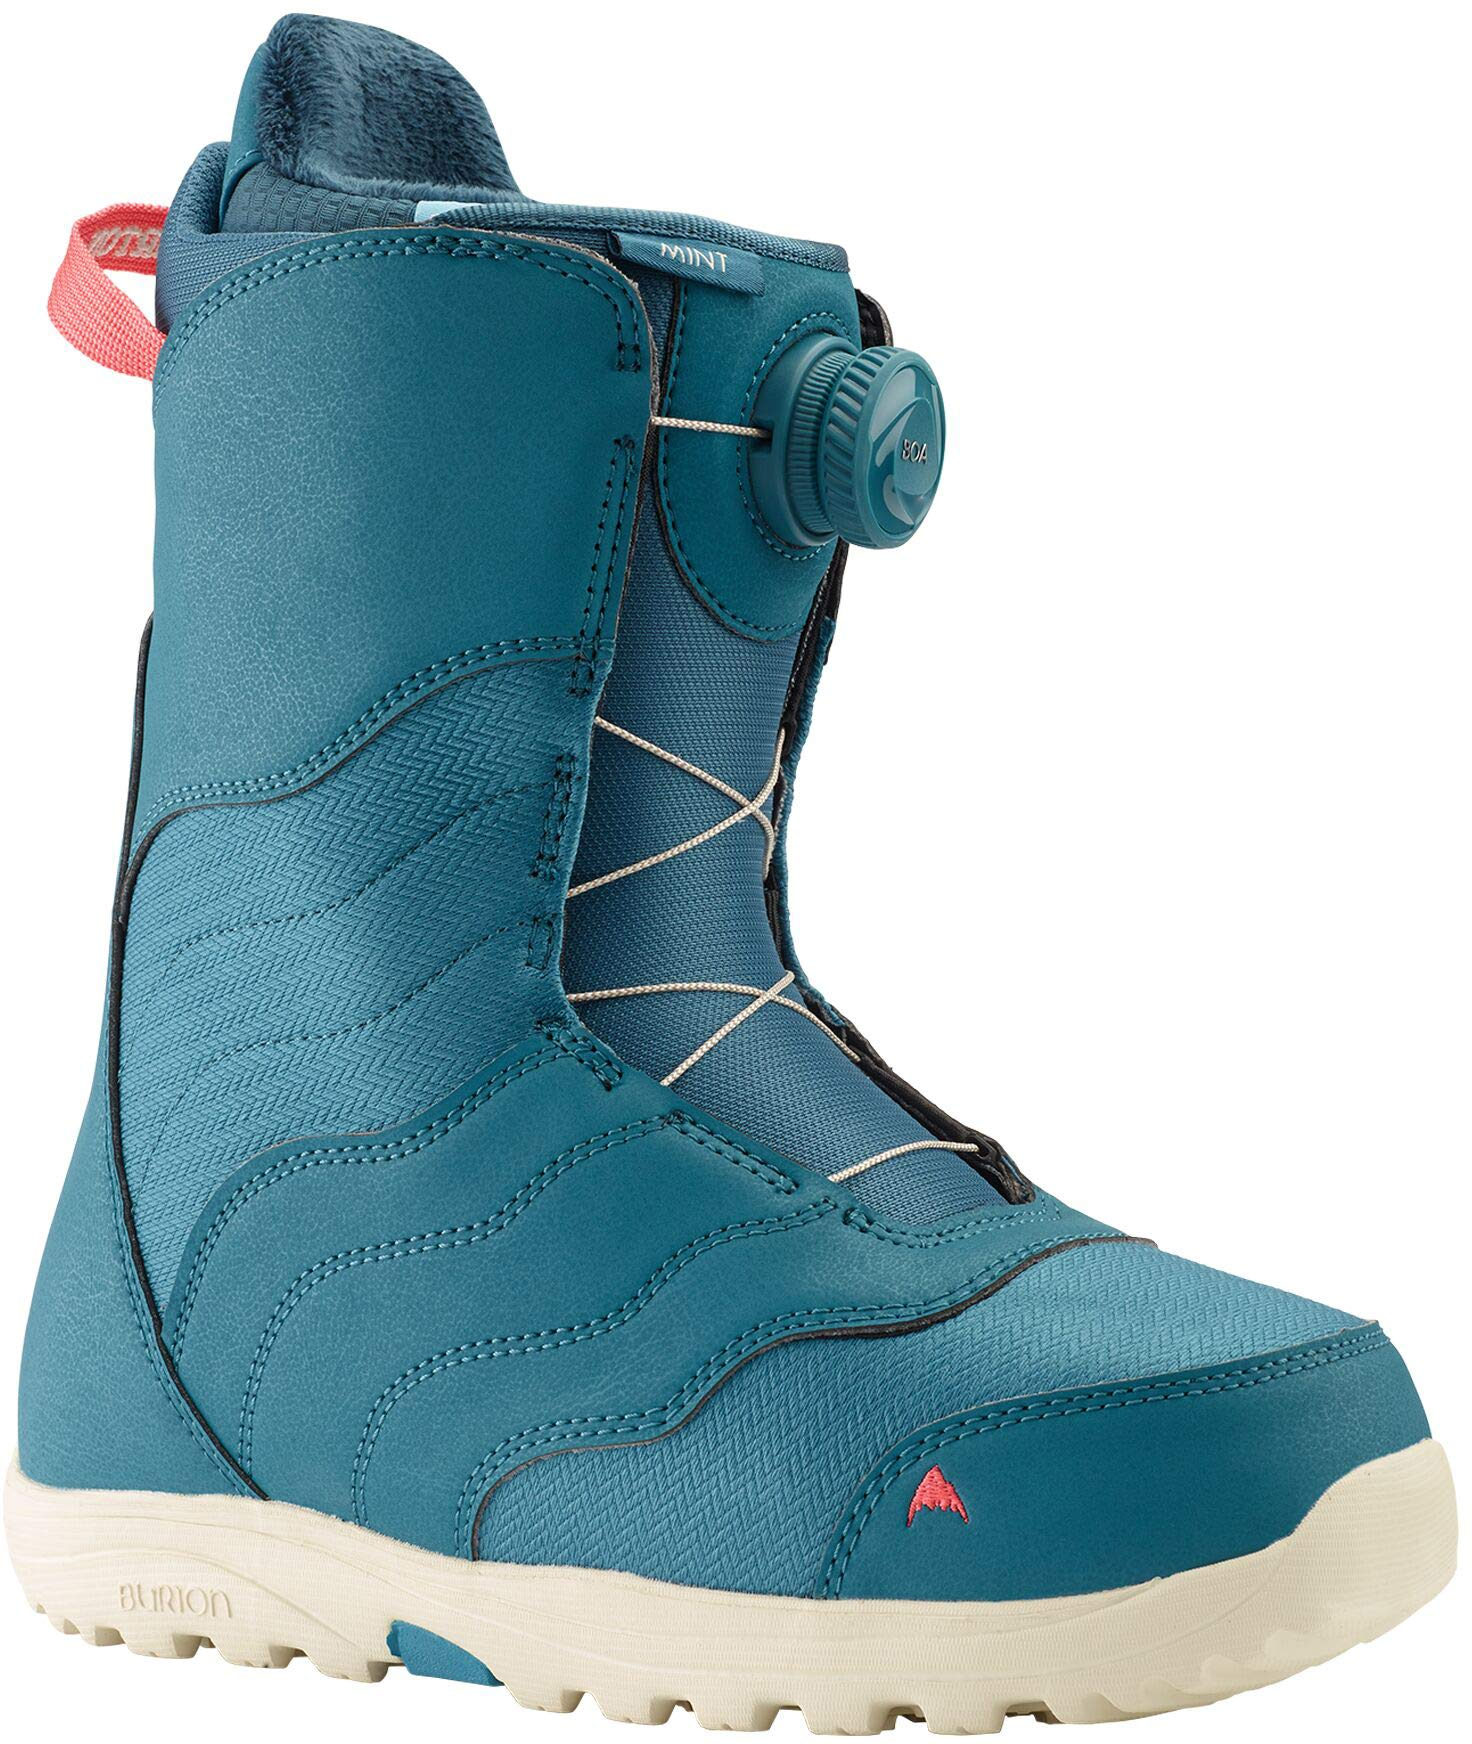 Burton Mint BOA Snowboard Boots Womens Sz 5 Storm Blue by Burton